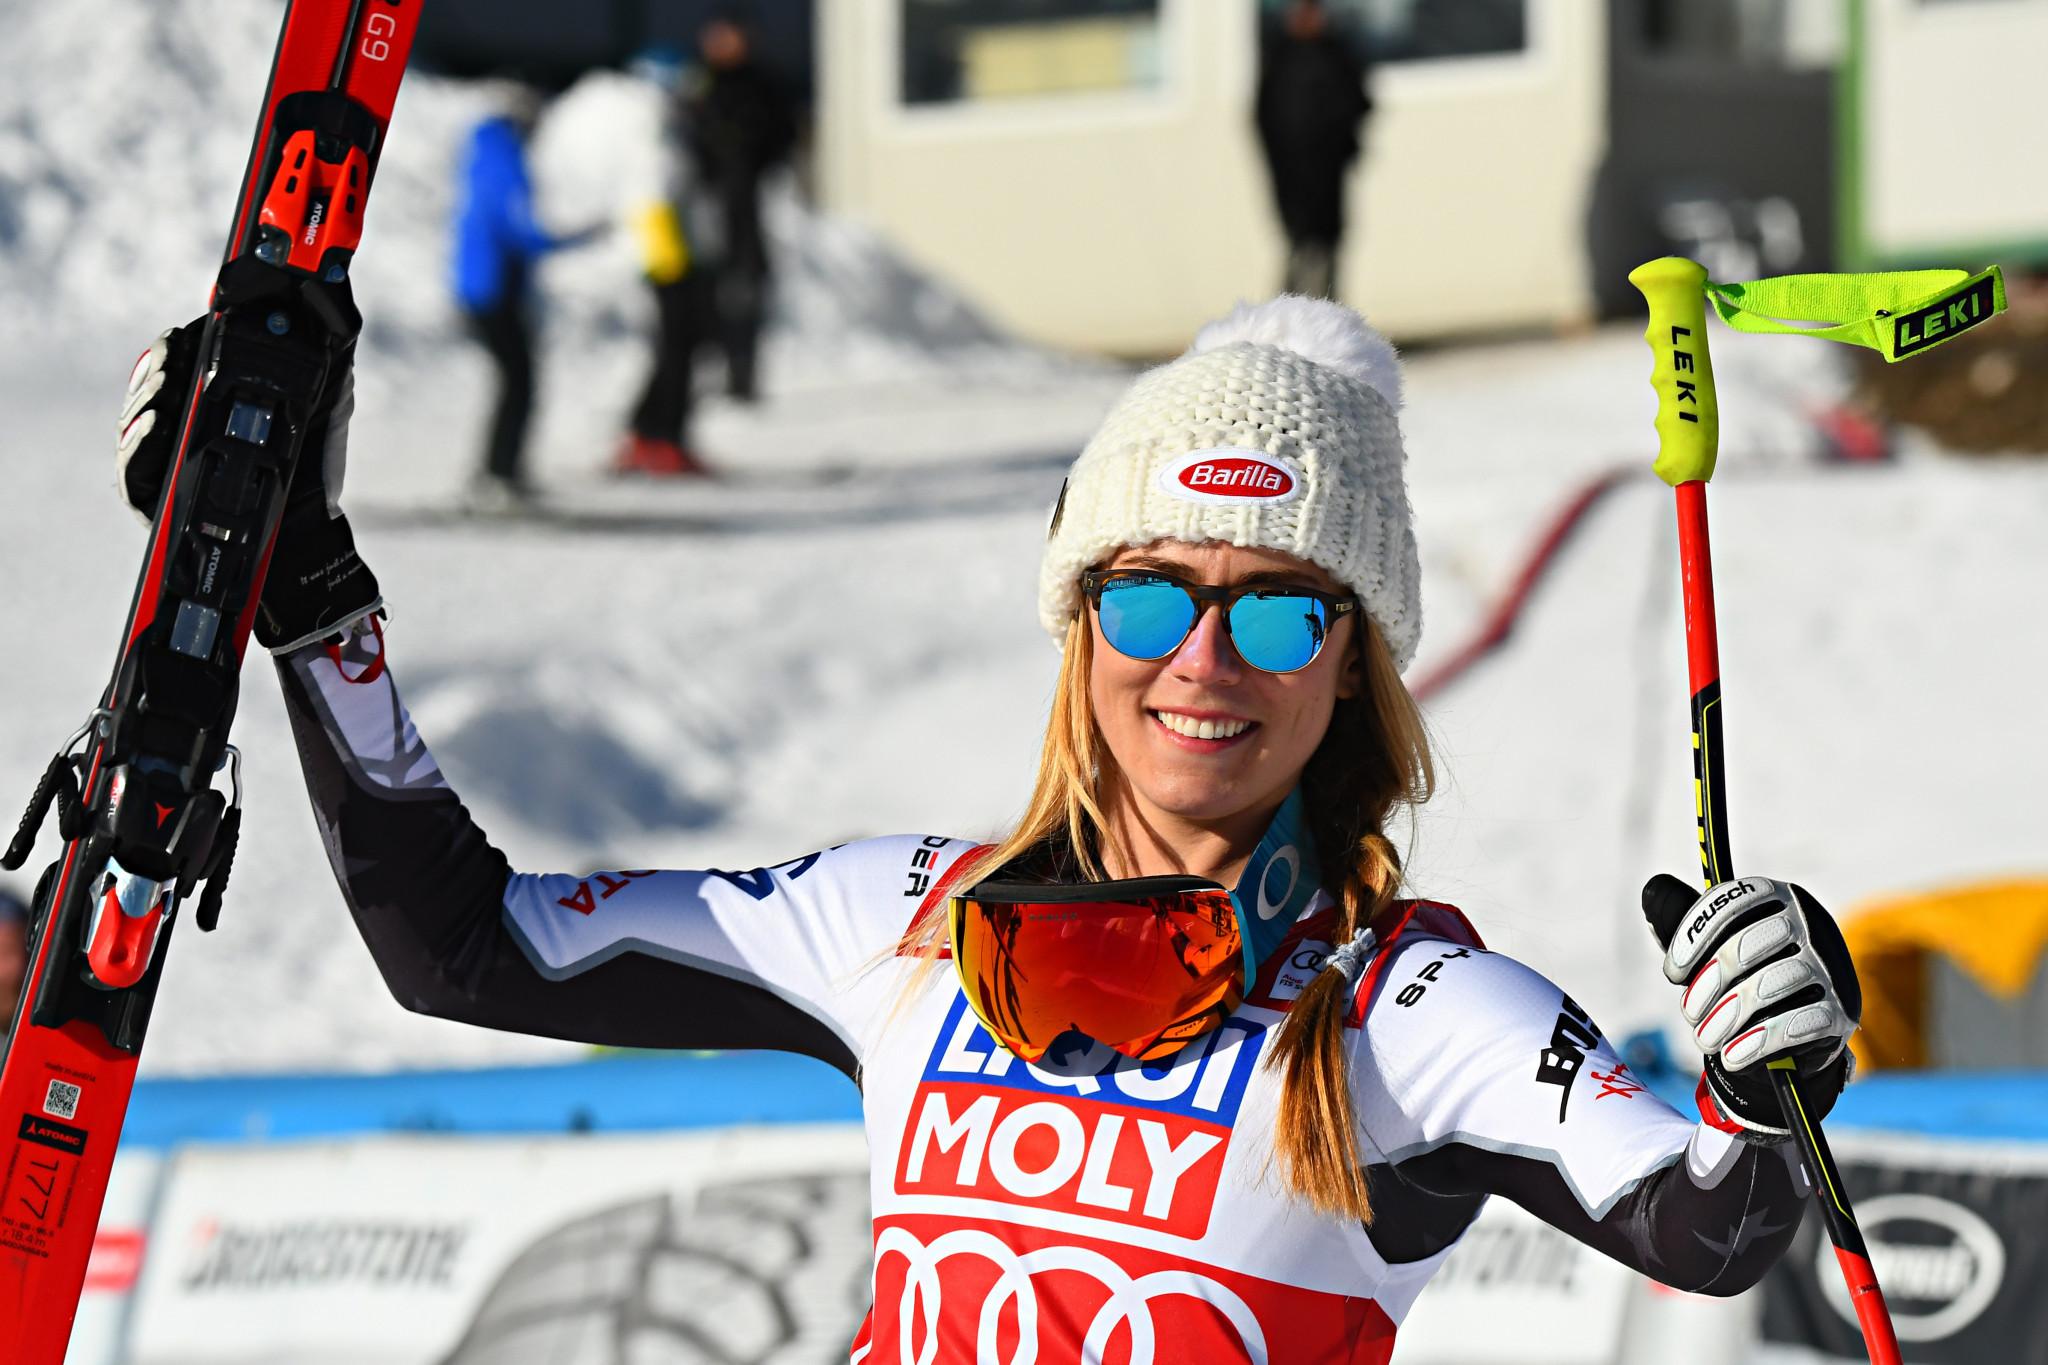 Shiffrin seeking latest win as FIS World Cup season continues